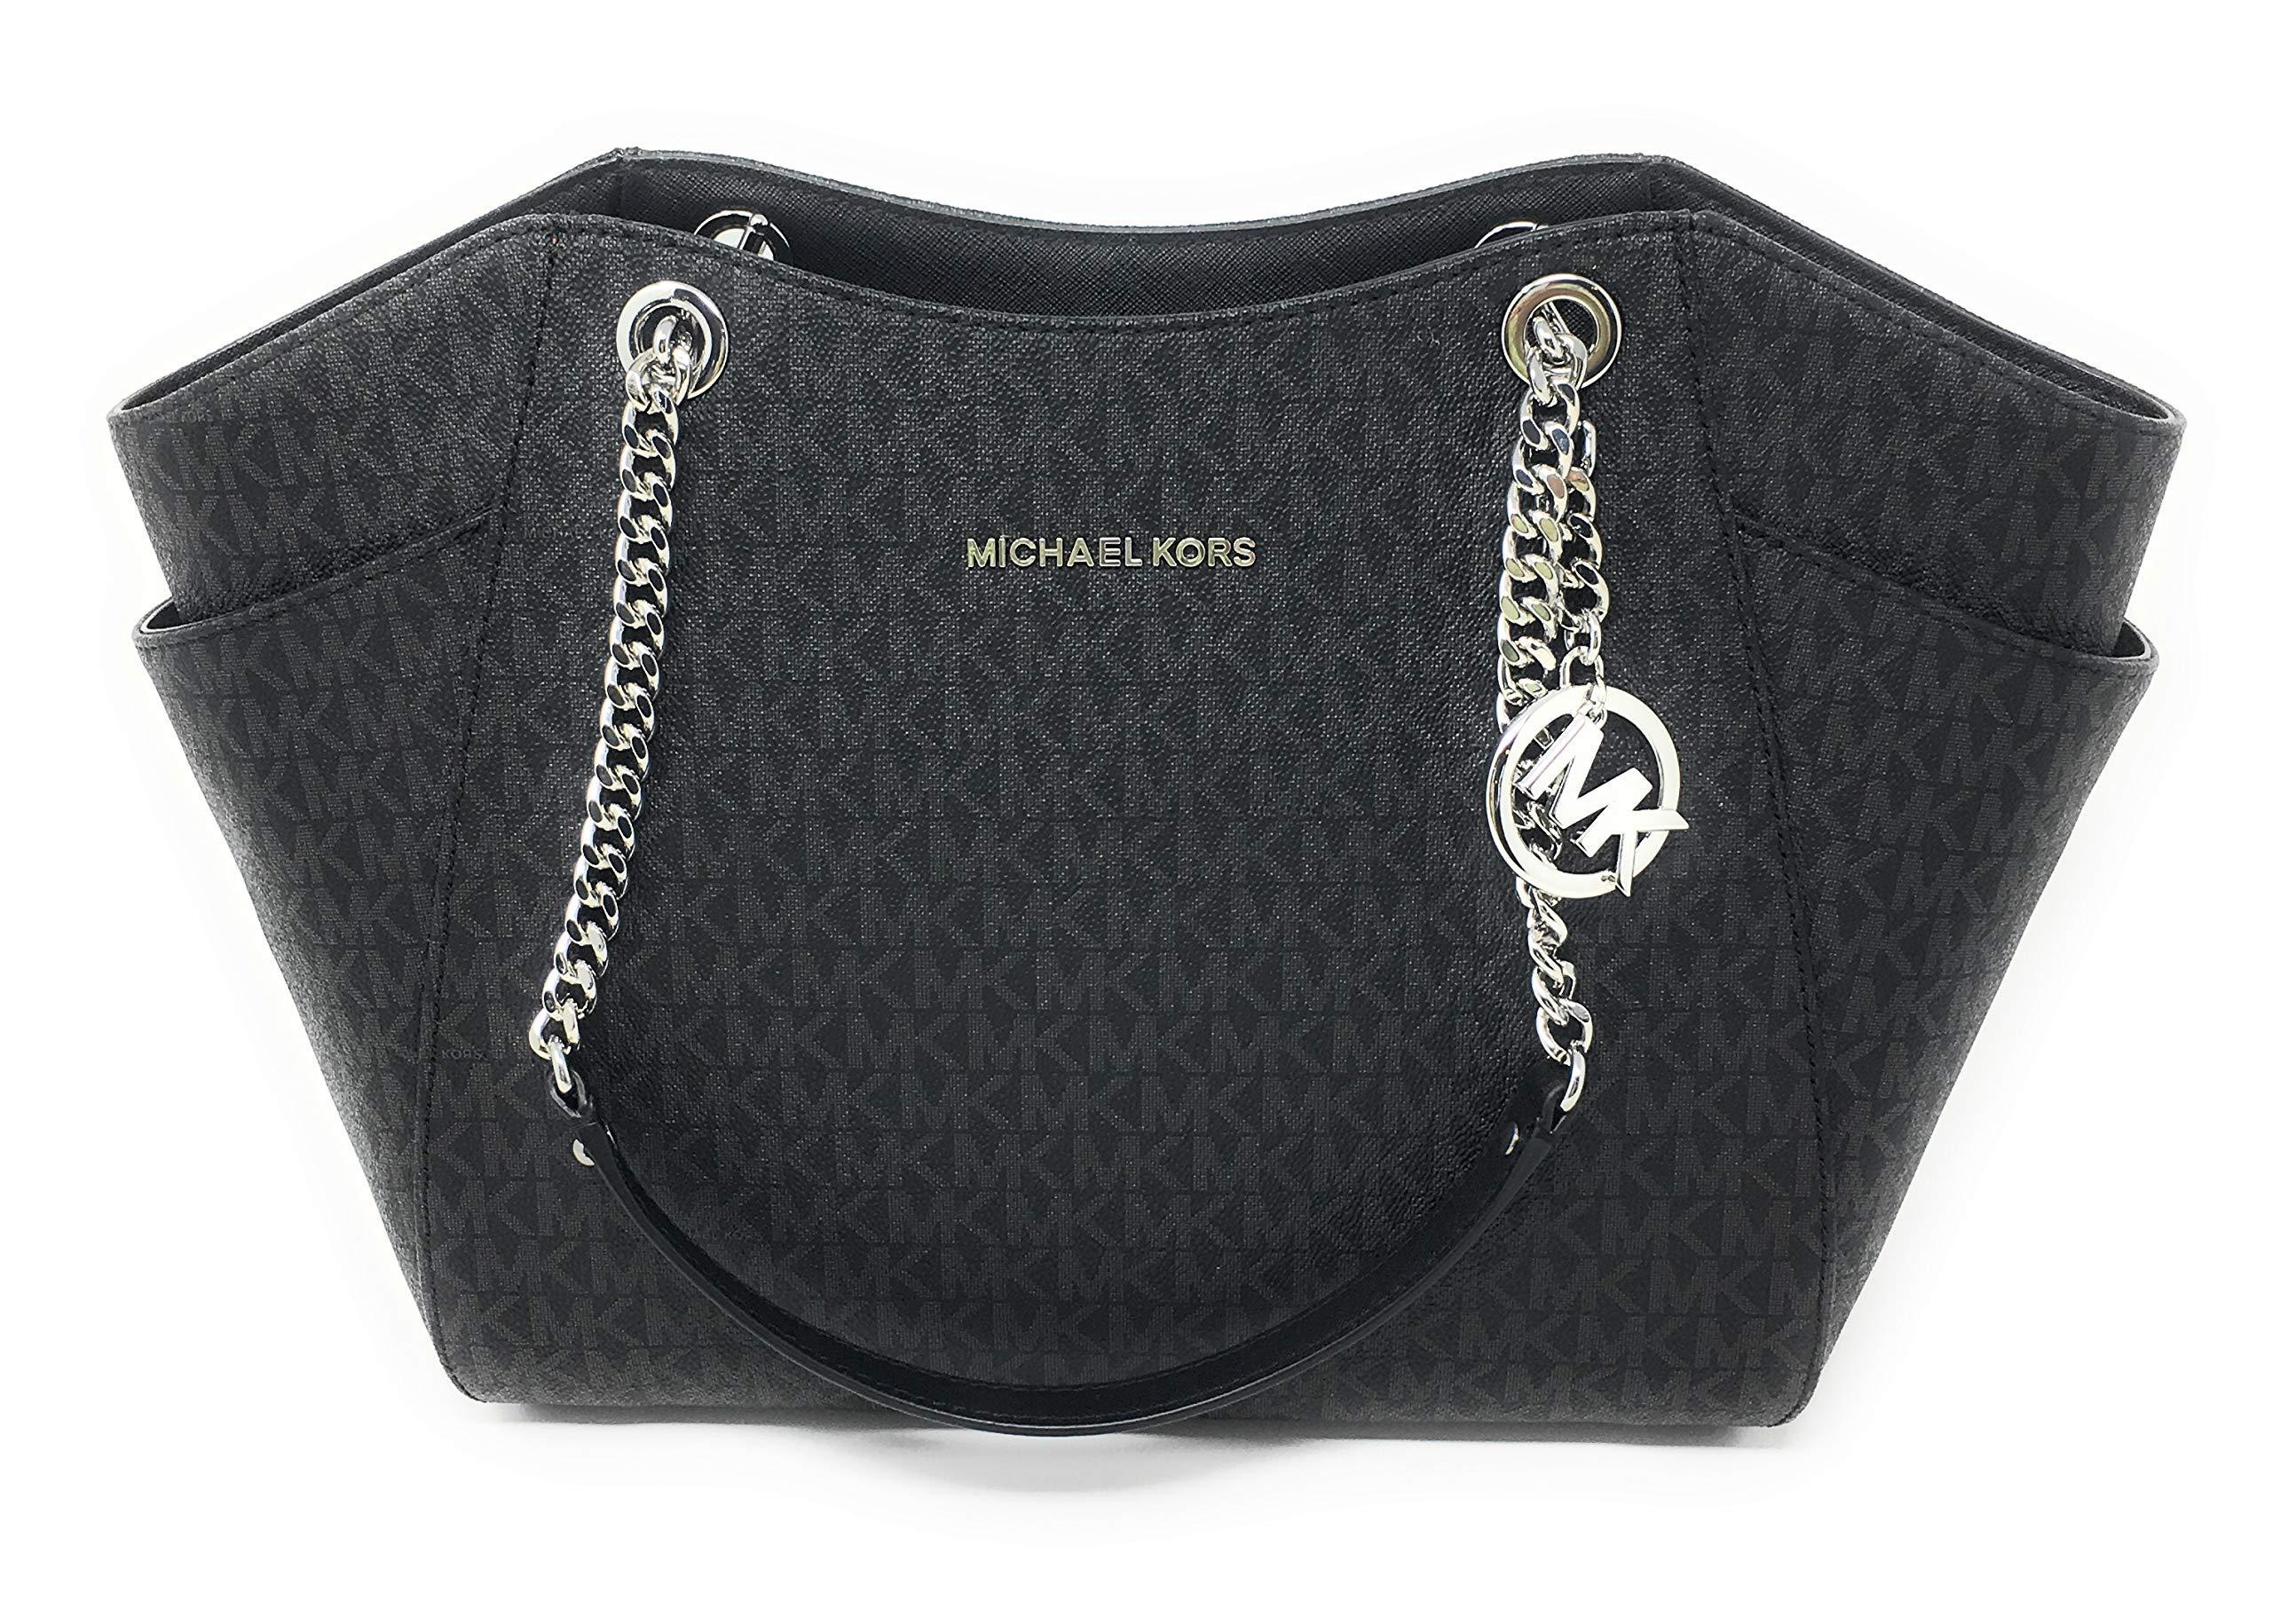 MICHAEL KORS SIGNATURE JET SET TRAVEL CHAIN SHOULDER TOTE BAG BLACK PVC by Michael Kors